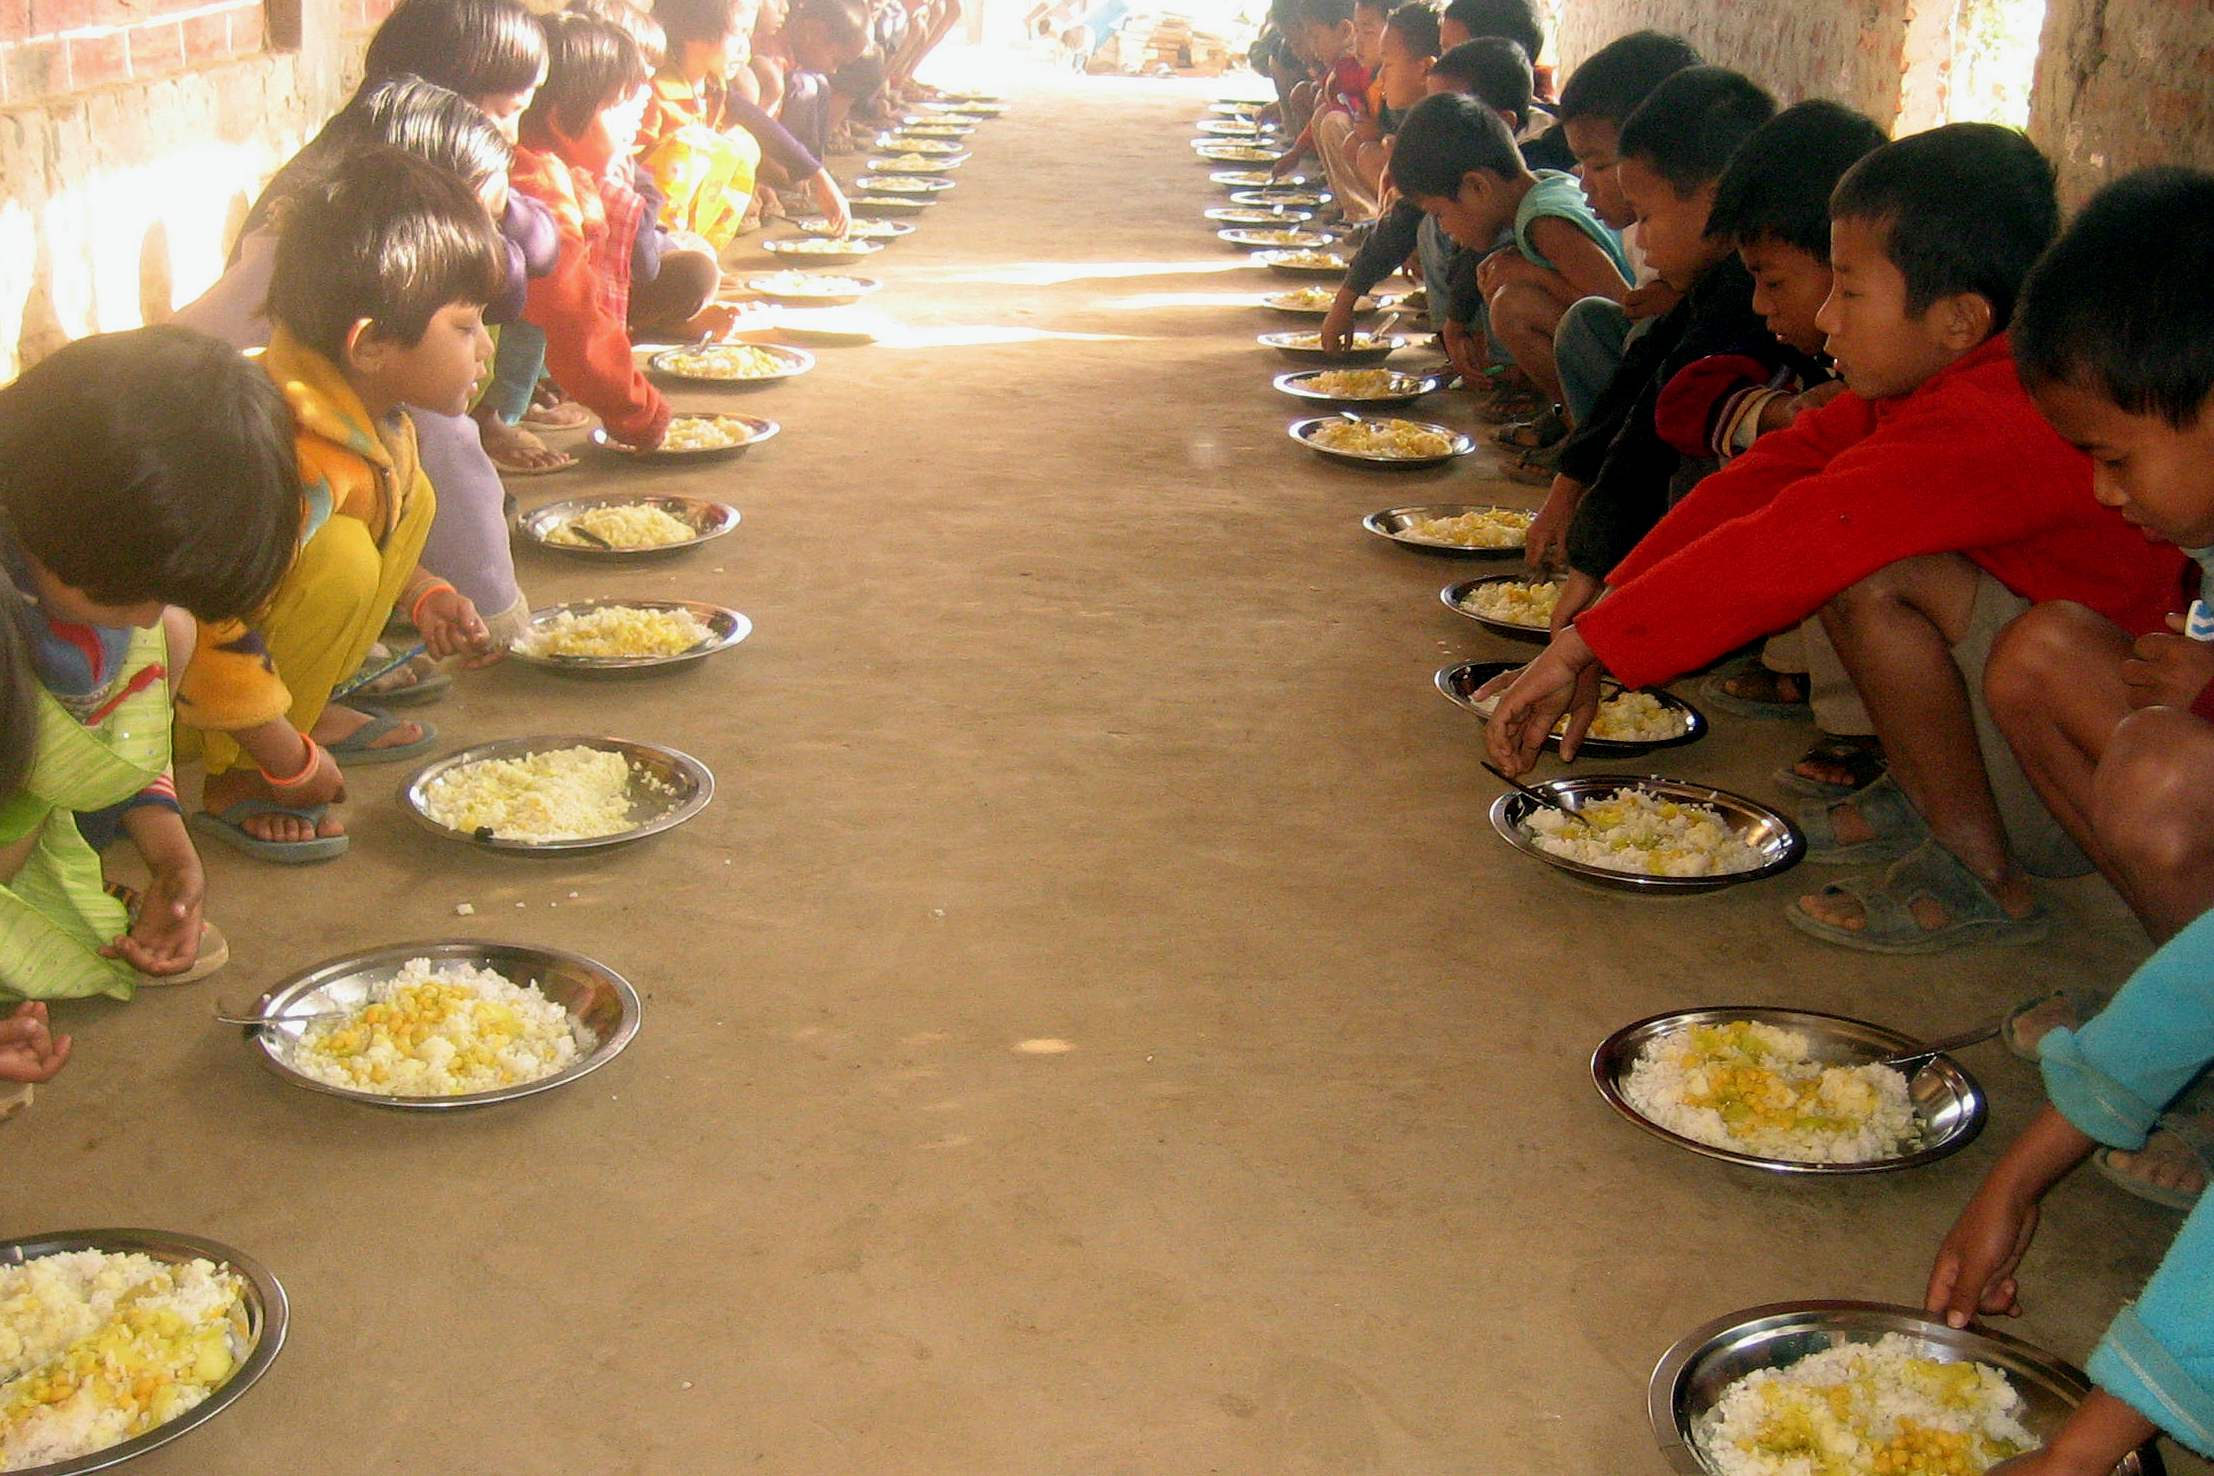 Main 4 Antioch School Child pray,eat on floor HOME-100_Final CROP 1500X1000.jpg